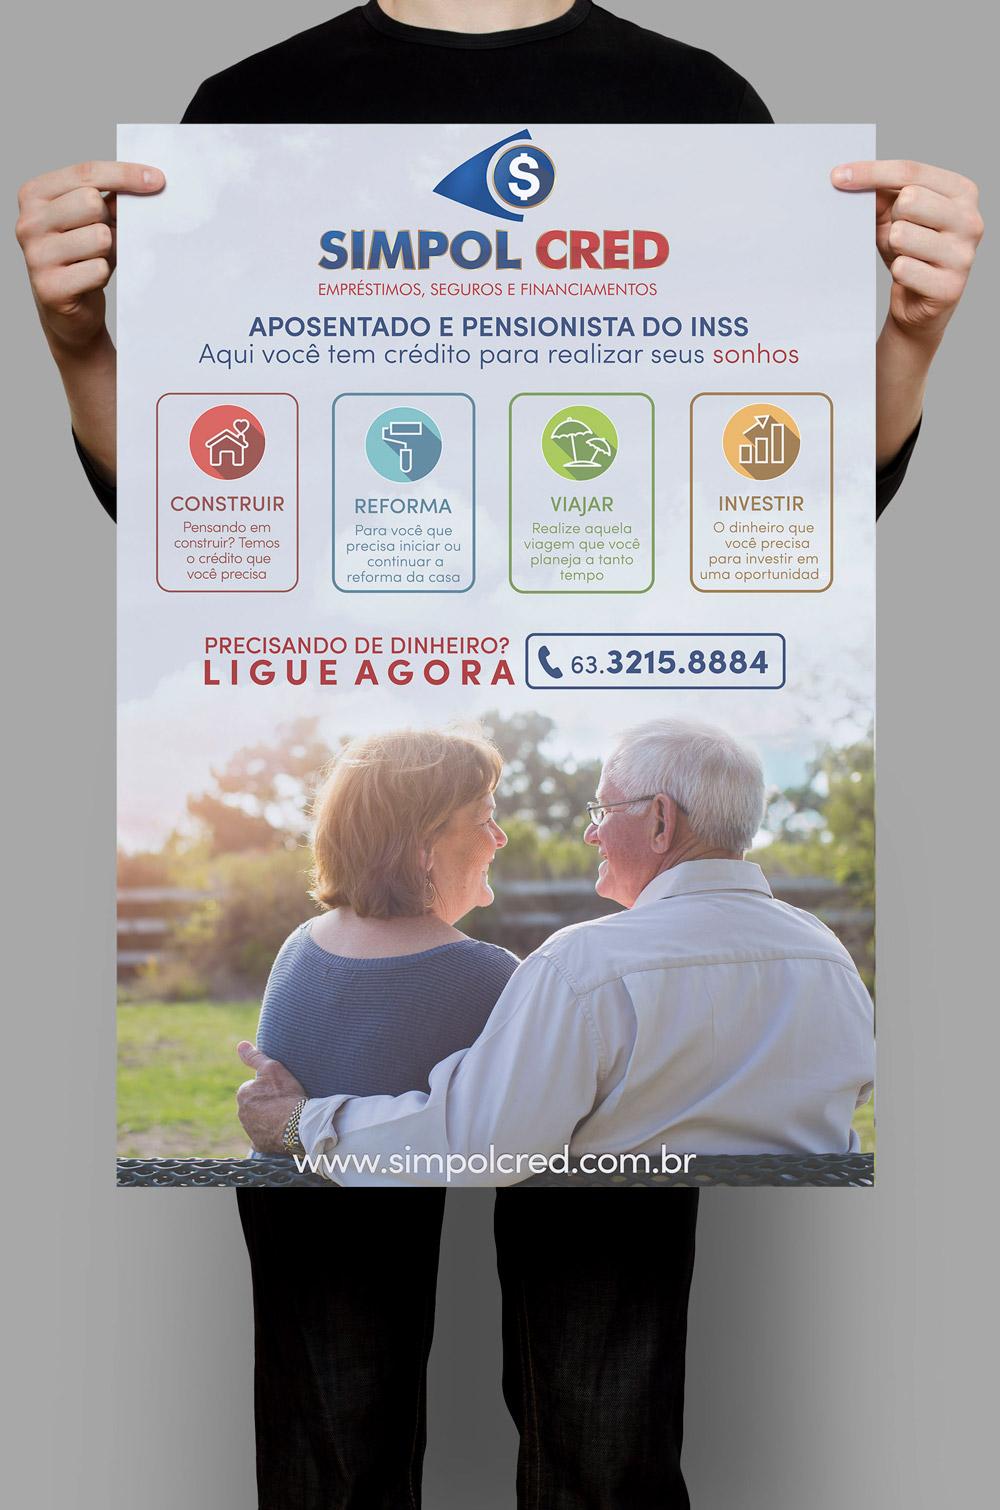 banner-marketng-para-corretora-de-seguros-simpol-cred-cartaz-aposentados